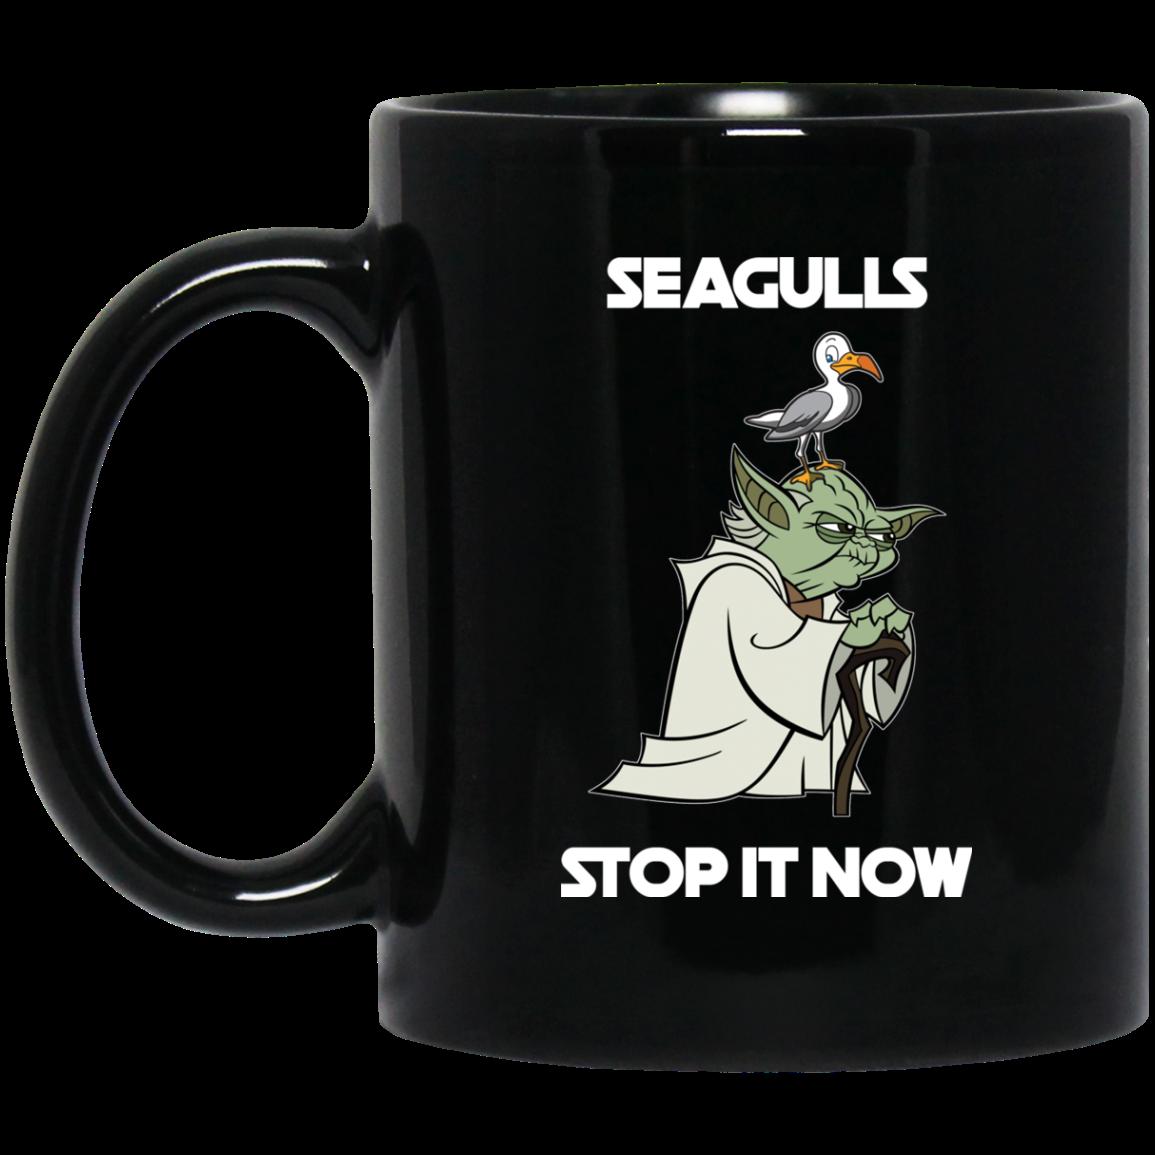 177346ec47e Seagulls - Stop It Now Coffee Mugs - RobinPlaceFabrics